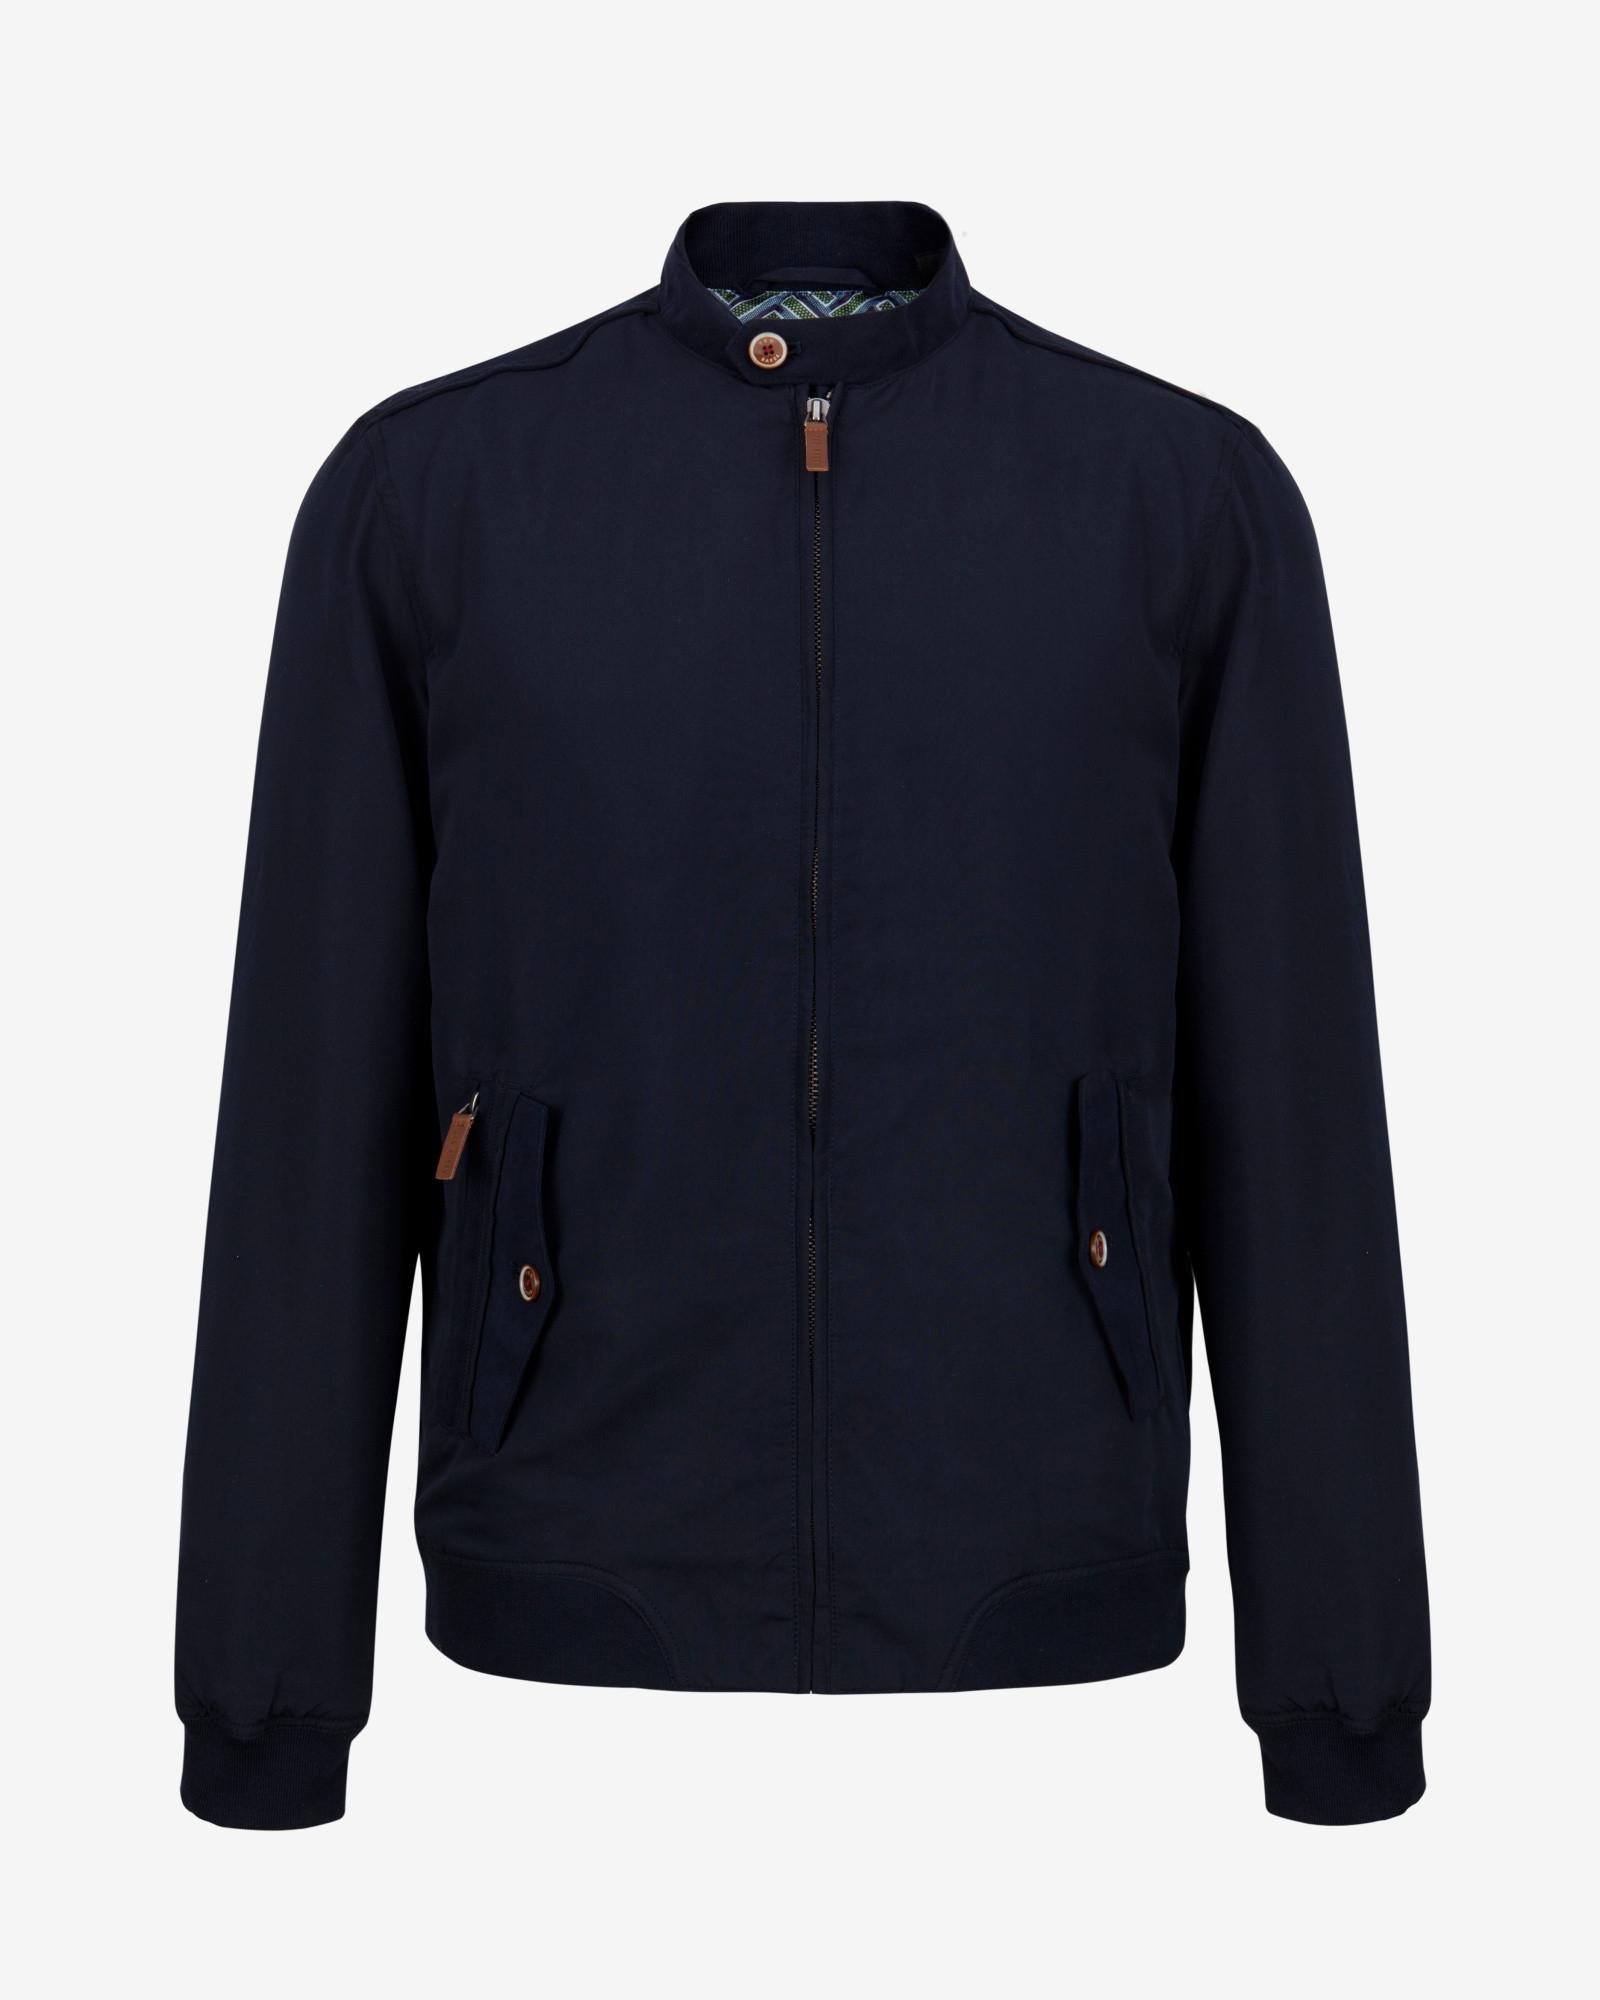 Ted Baker Tall Bomber Jacket In Blue For Men Navy Lyst